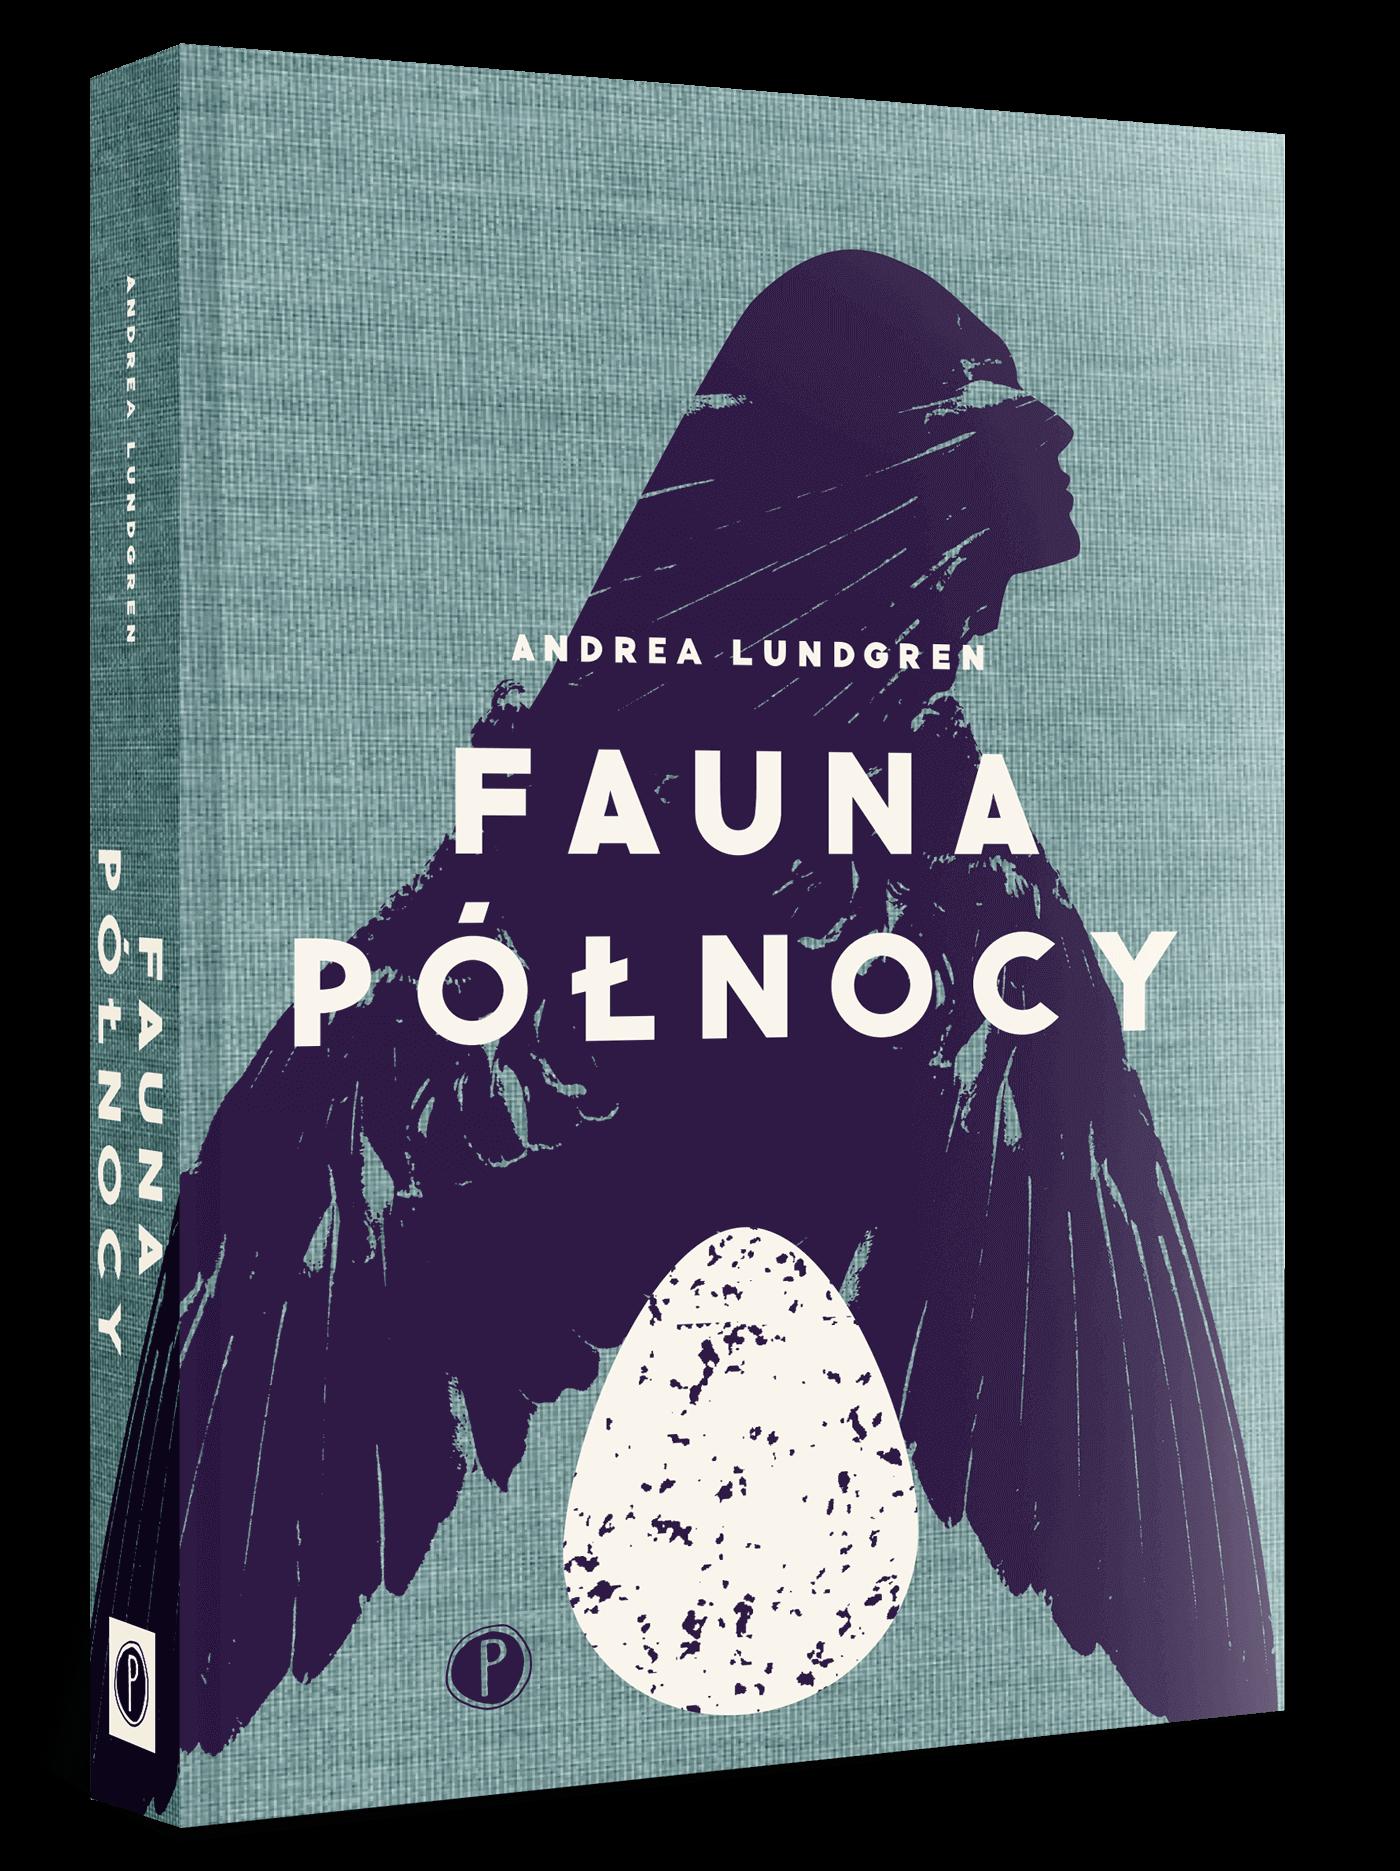 FaunaPolnocy_3D_small